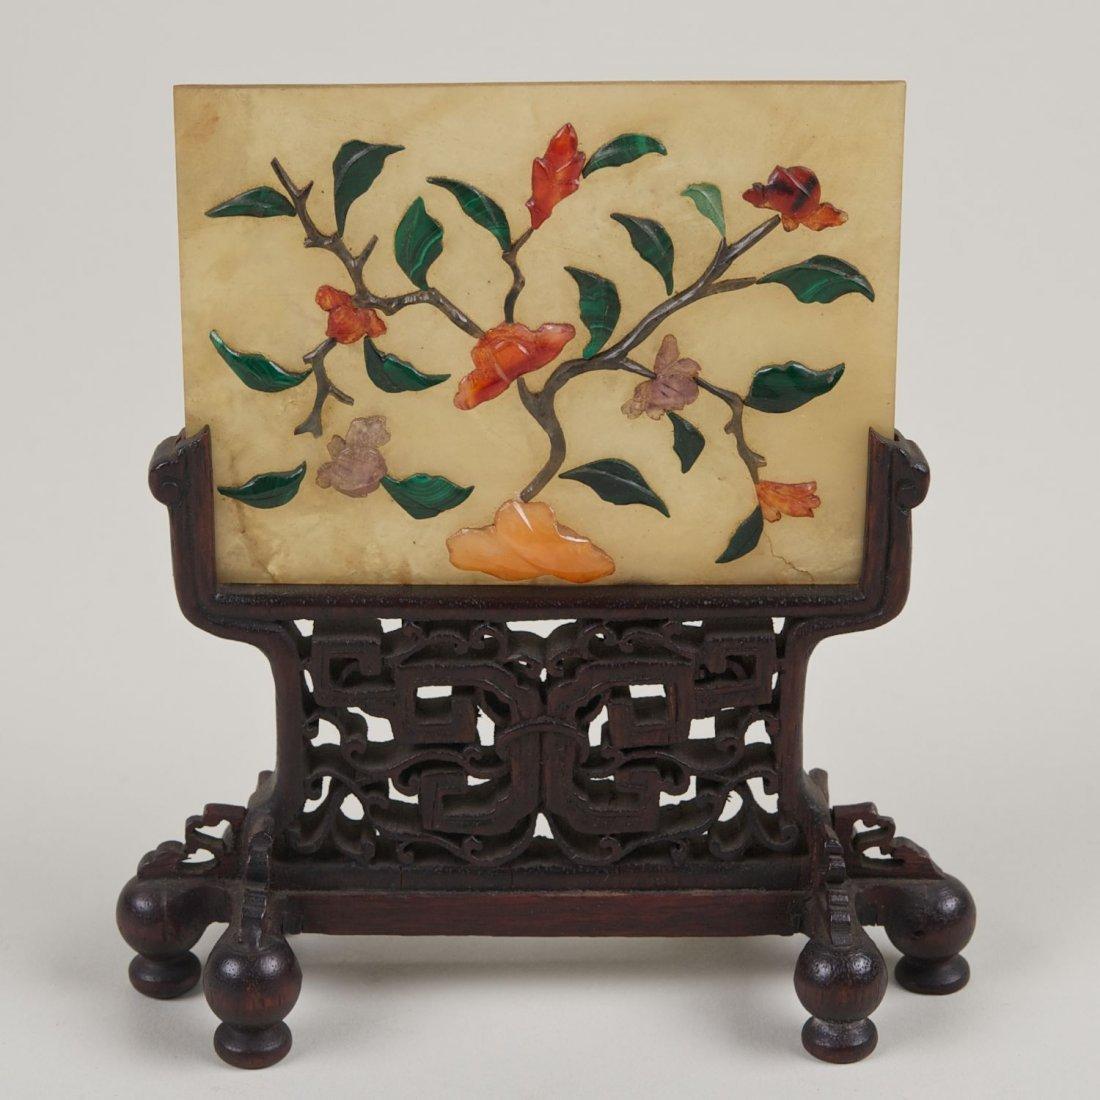 Chinese hardstone inlaid jade plaque